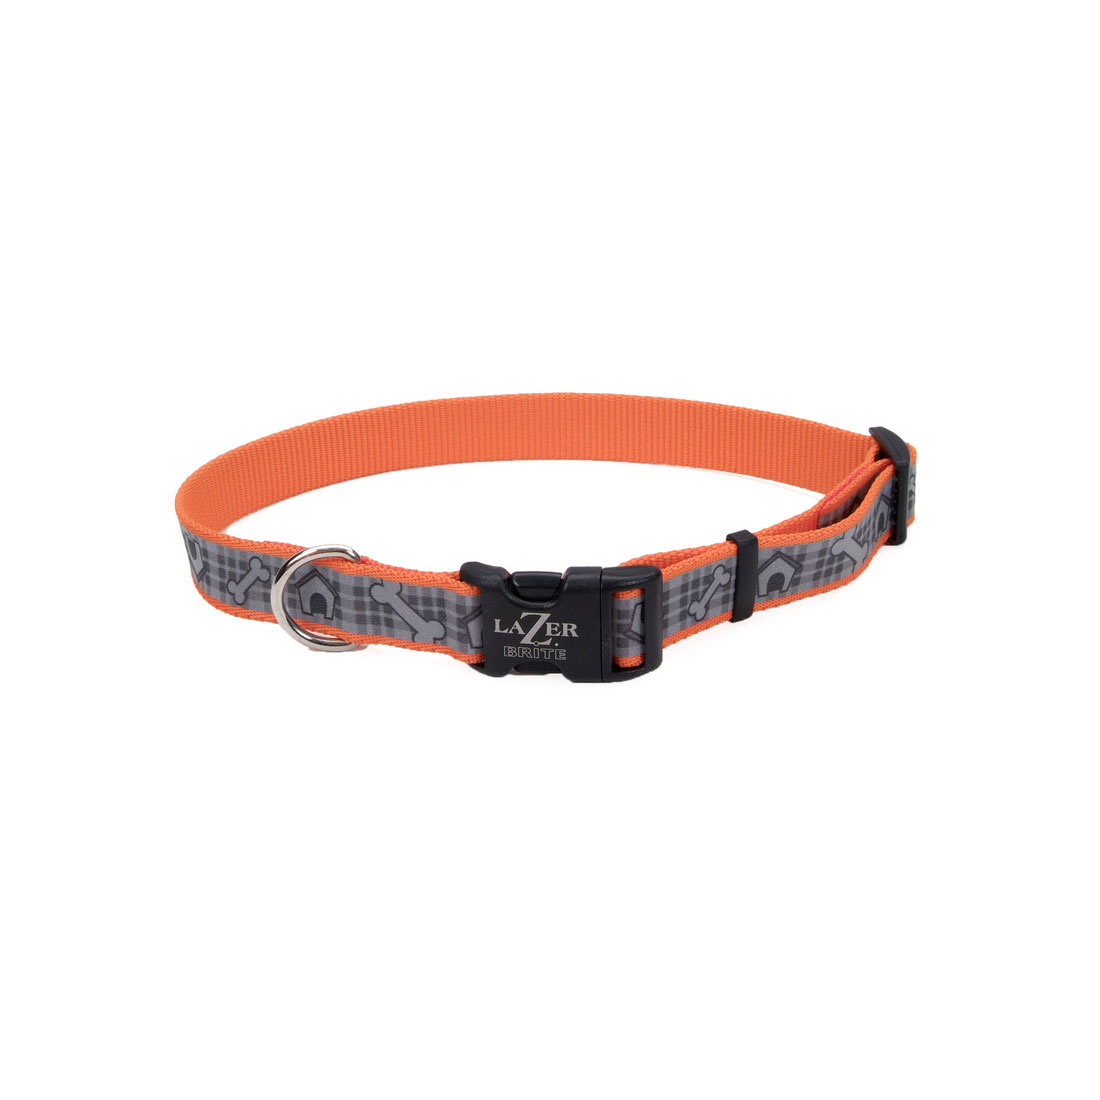 Lazer Brite Reflective Adjustable Dog Collar, Orange Dog Houses Image